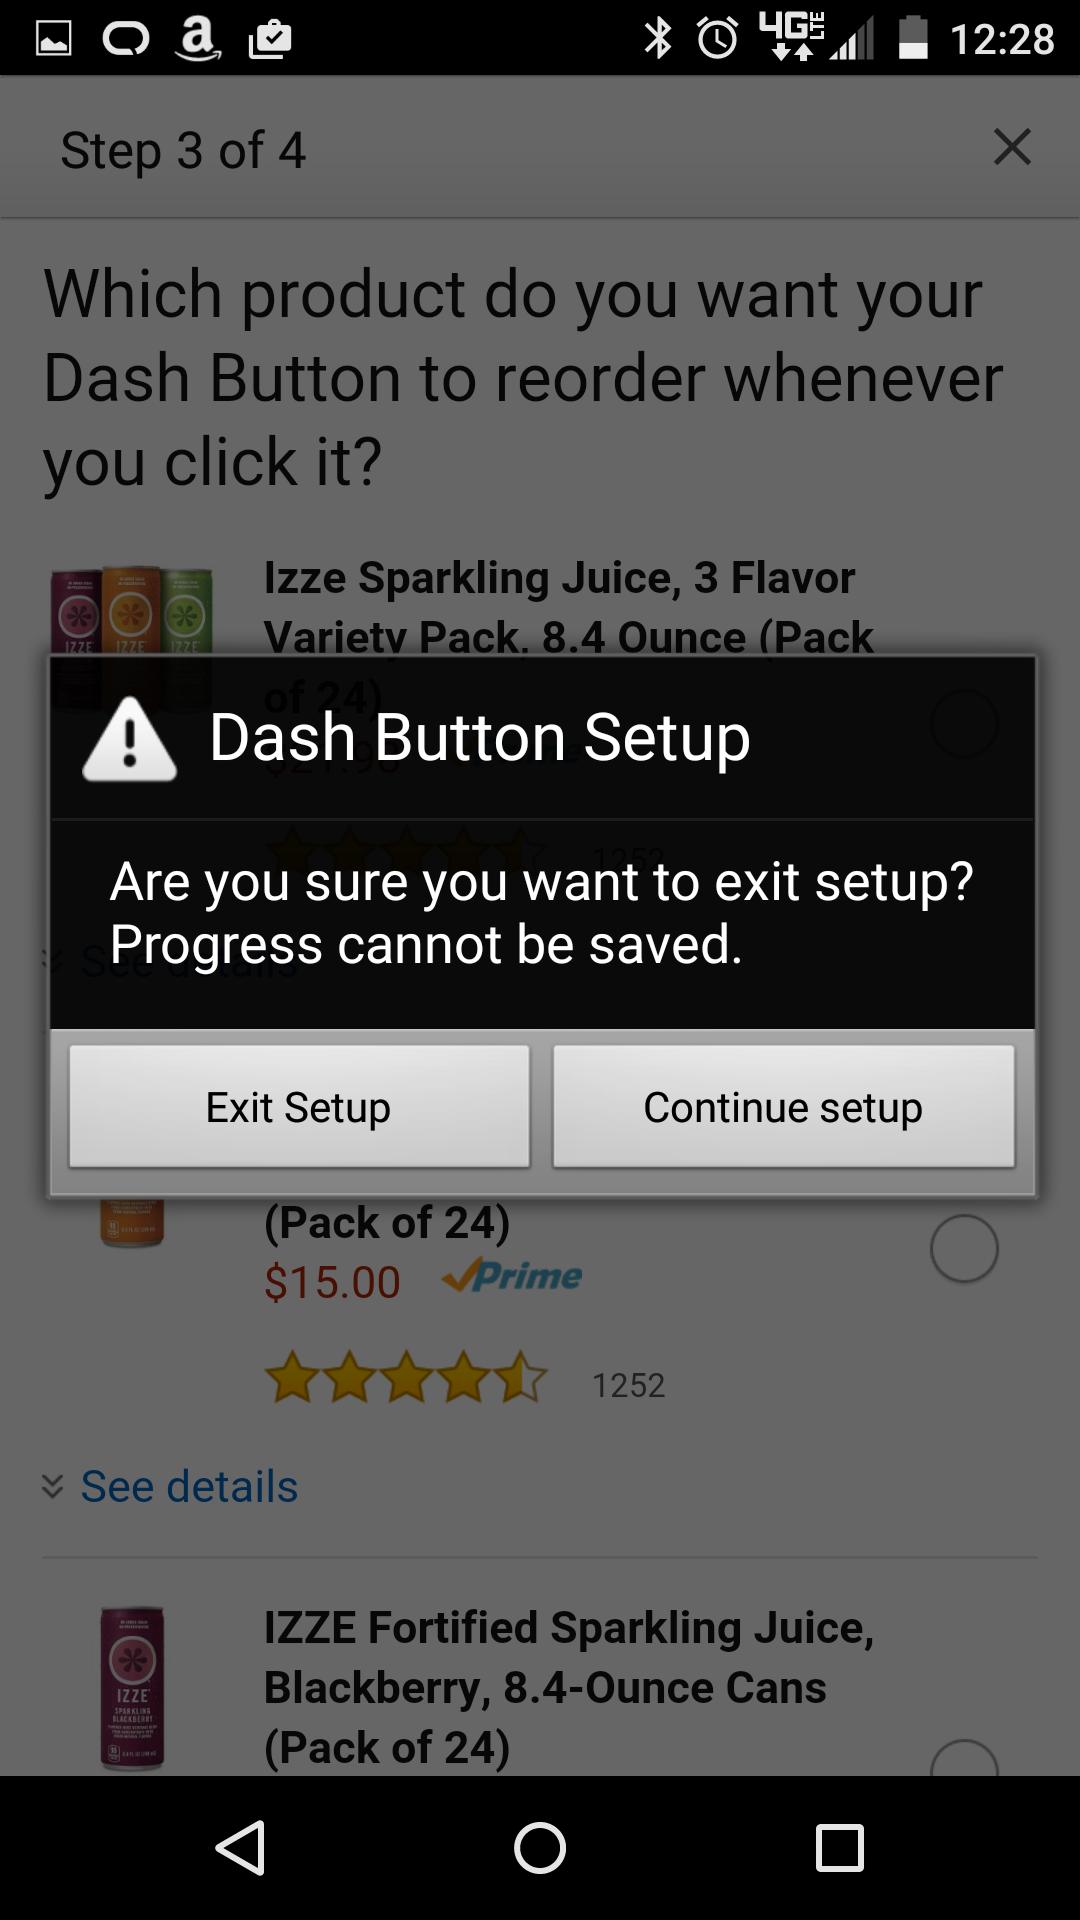 Hacking Amazon Dash Buttons - David Kryzaniak, LLCDavid Kryzaniak, LLC